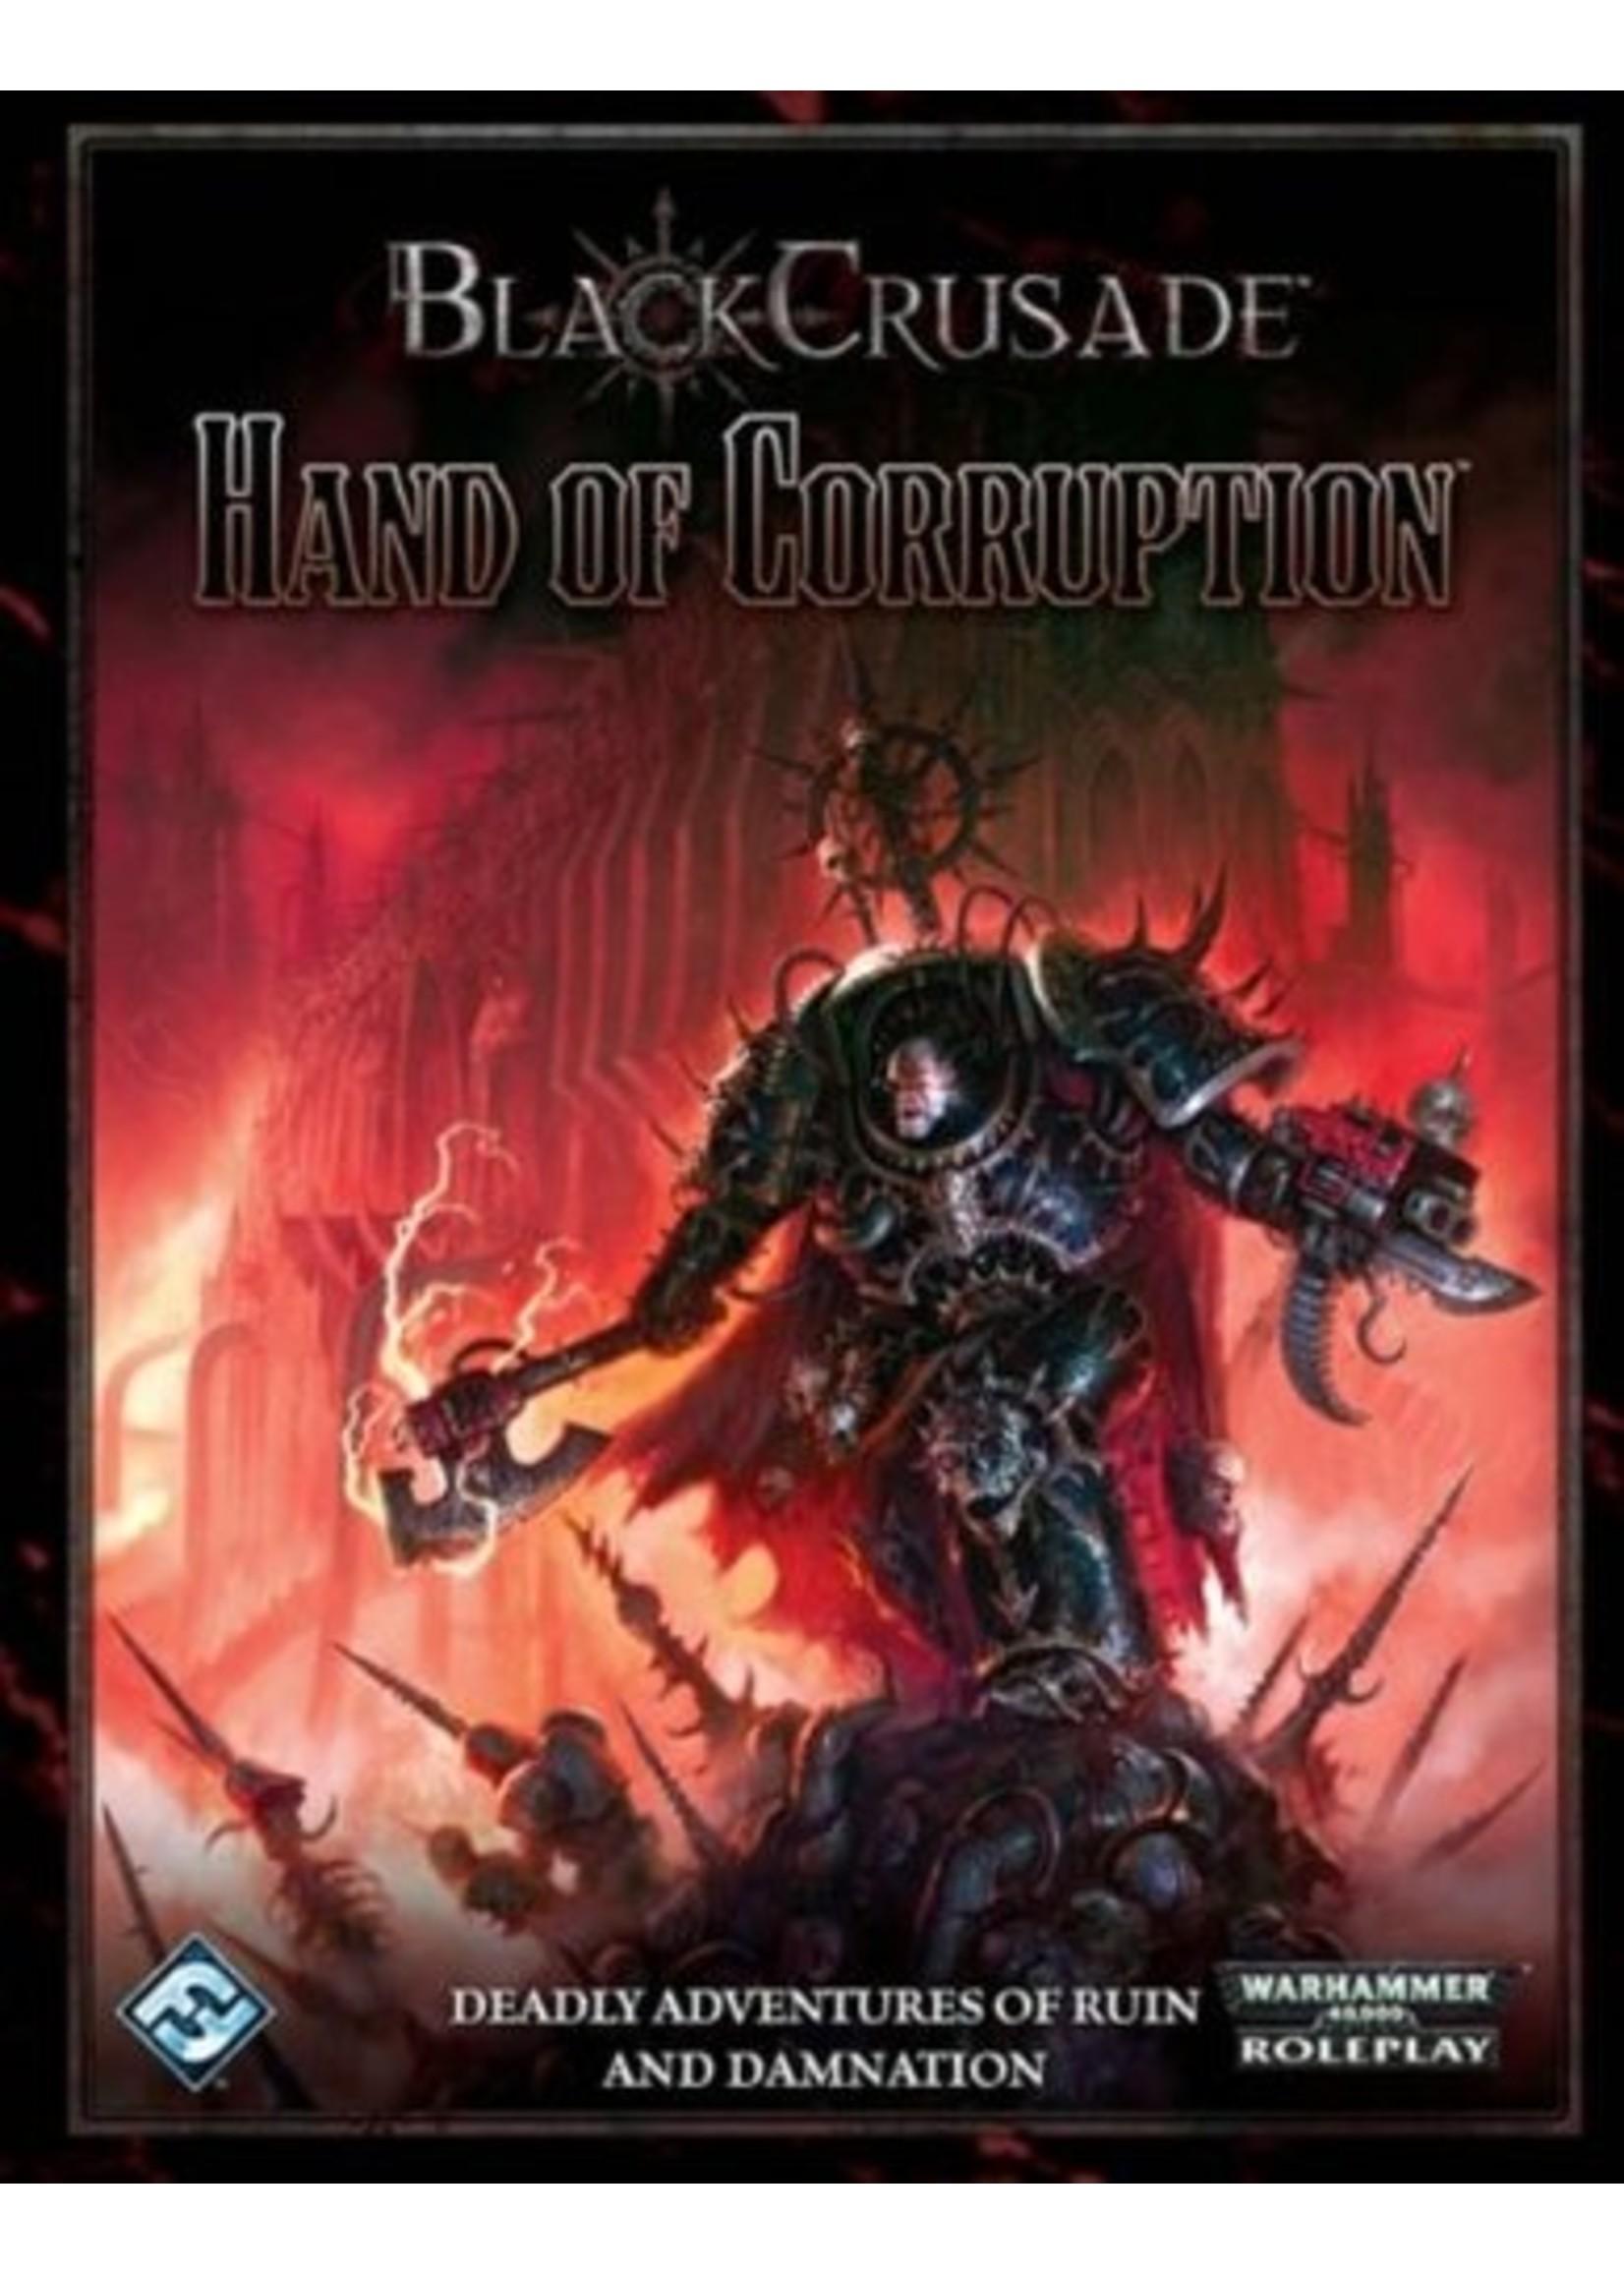 Black Crusade Warhammer 40K RPG: Hand of Corruption Hardcover